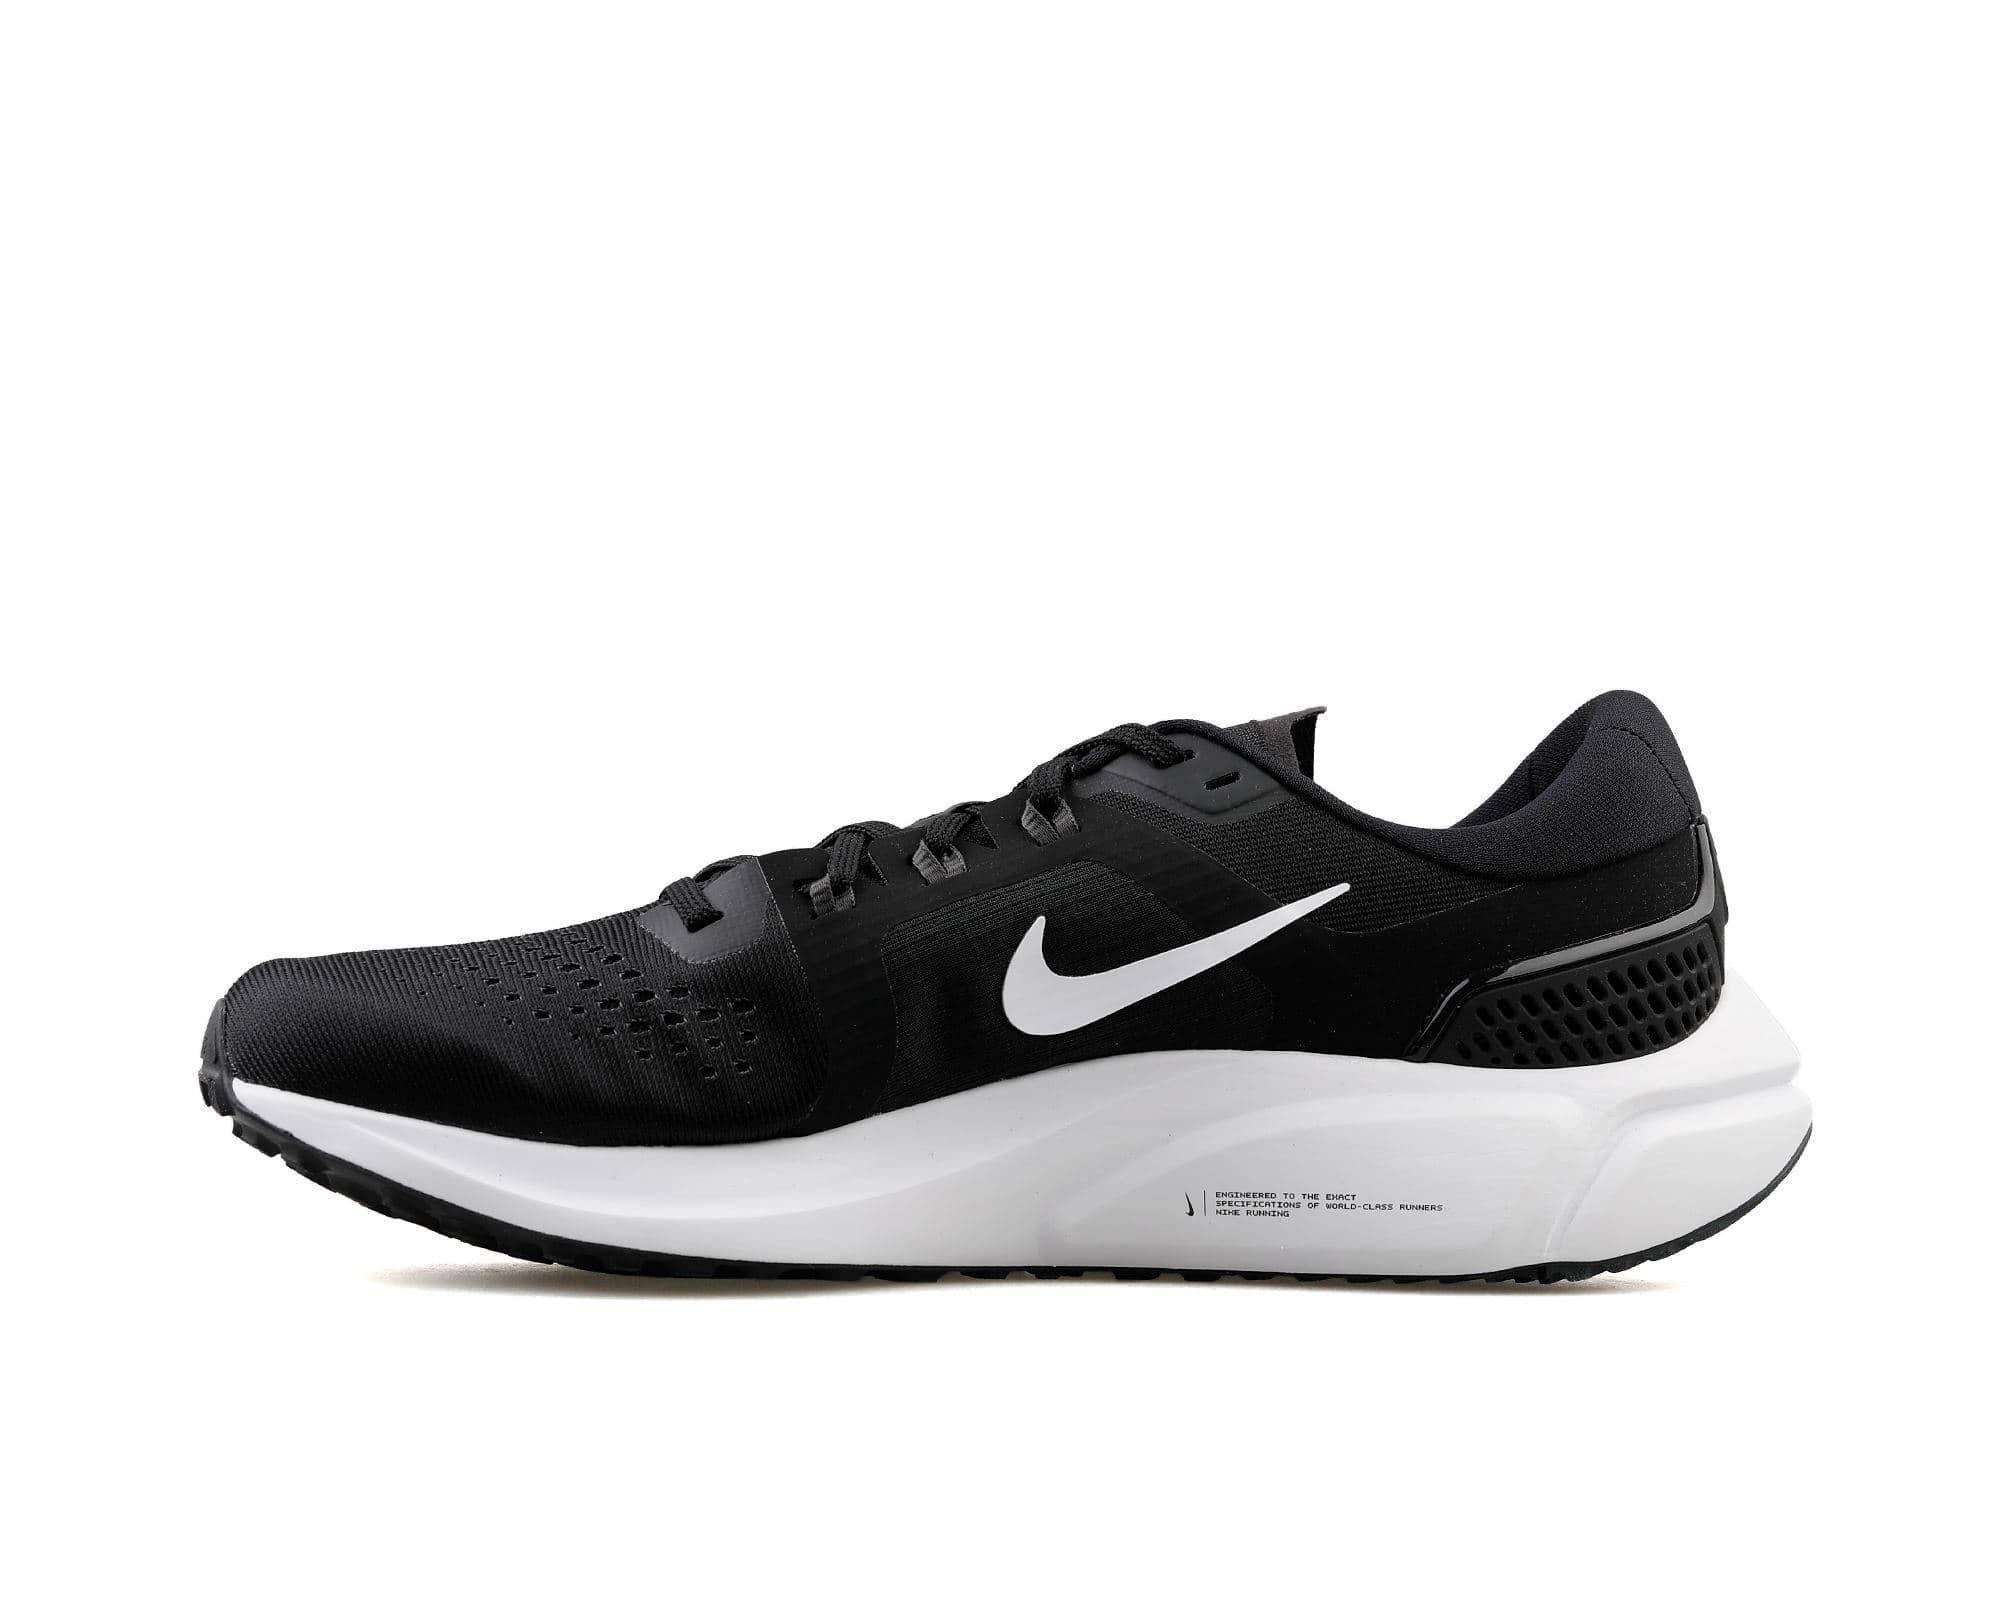 Air Zoom Vomero 15 Erkek Siyah Koşu Ayakkabı (CU1855-001)